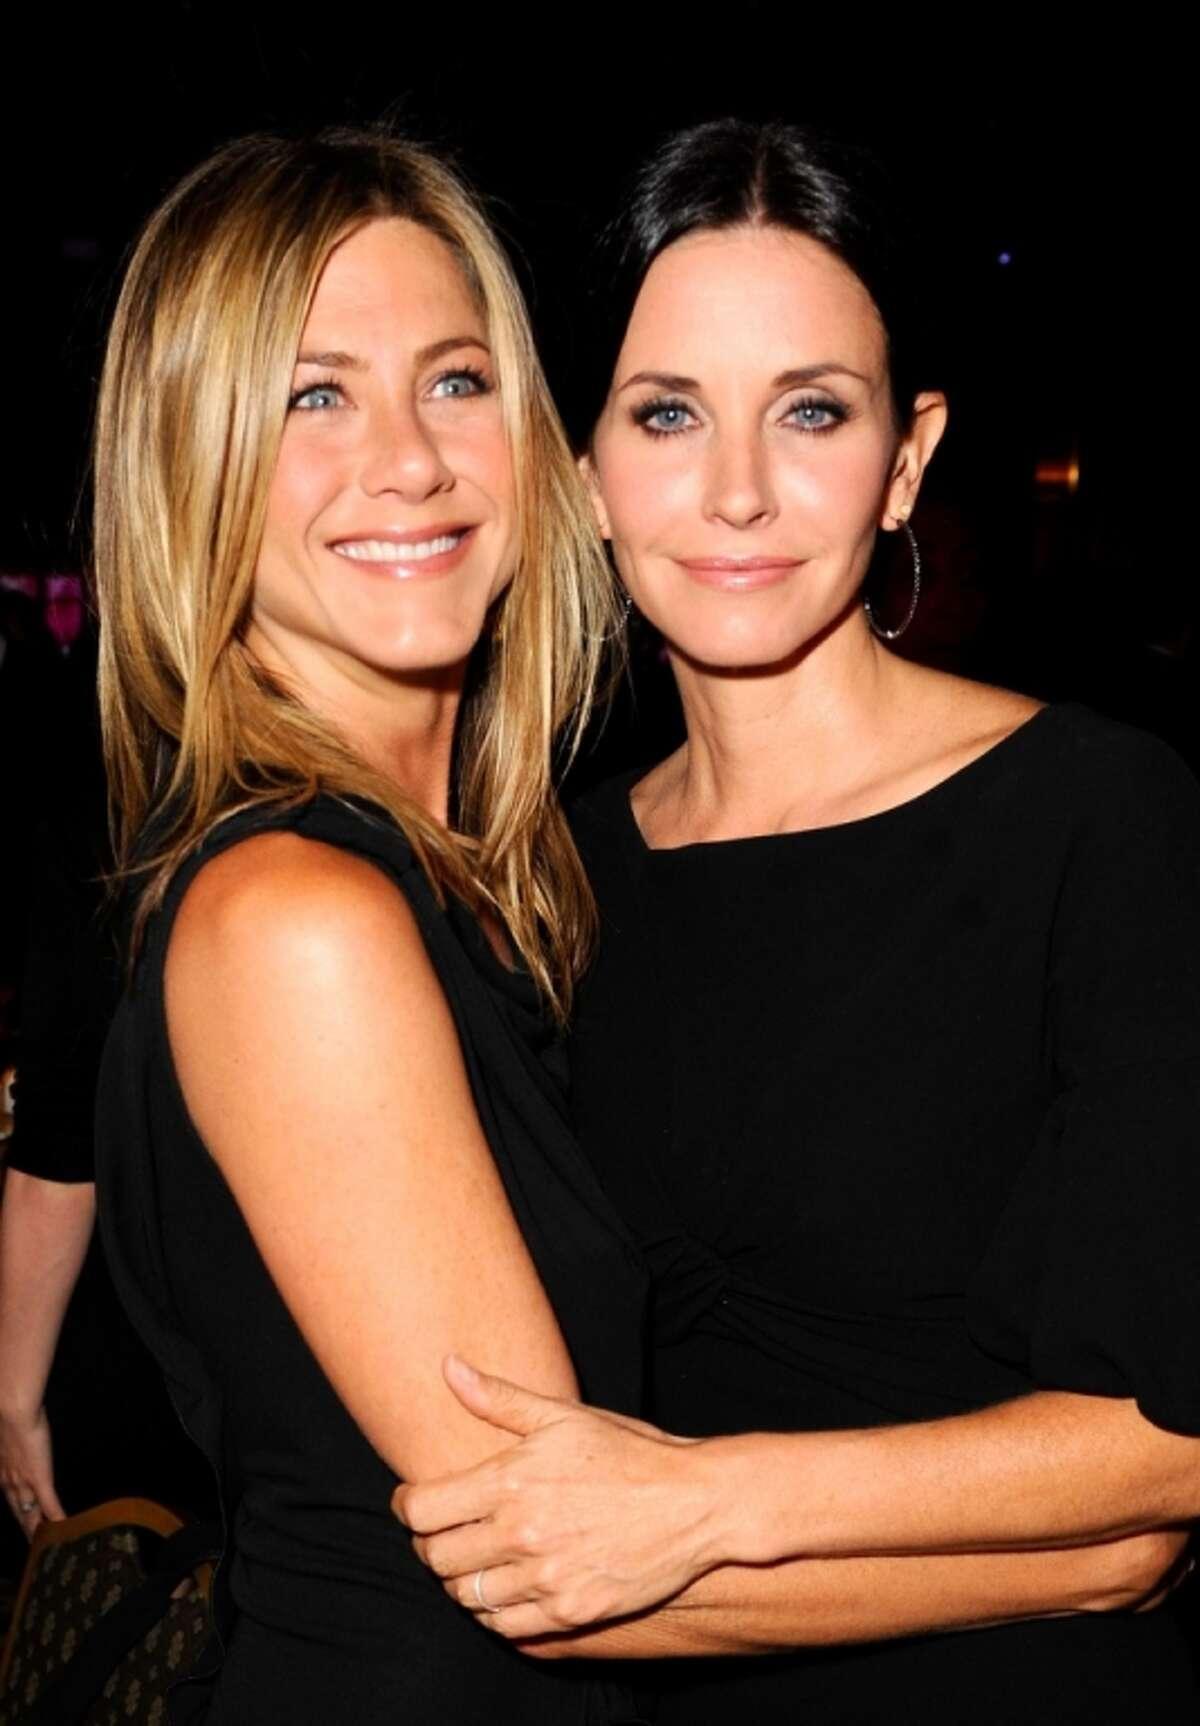 Actresses Jennifer Aniston and Courteney Cox